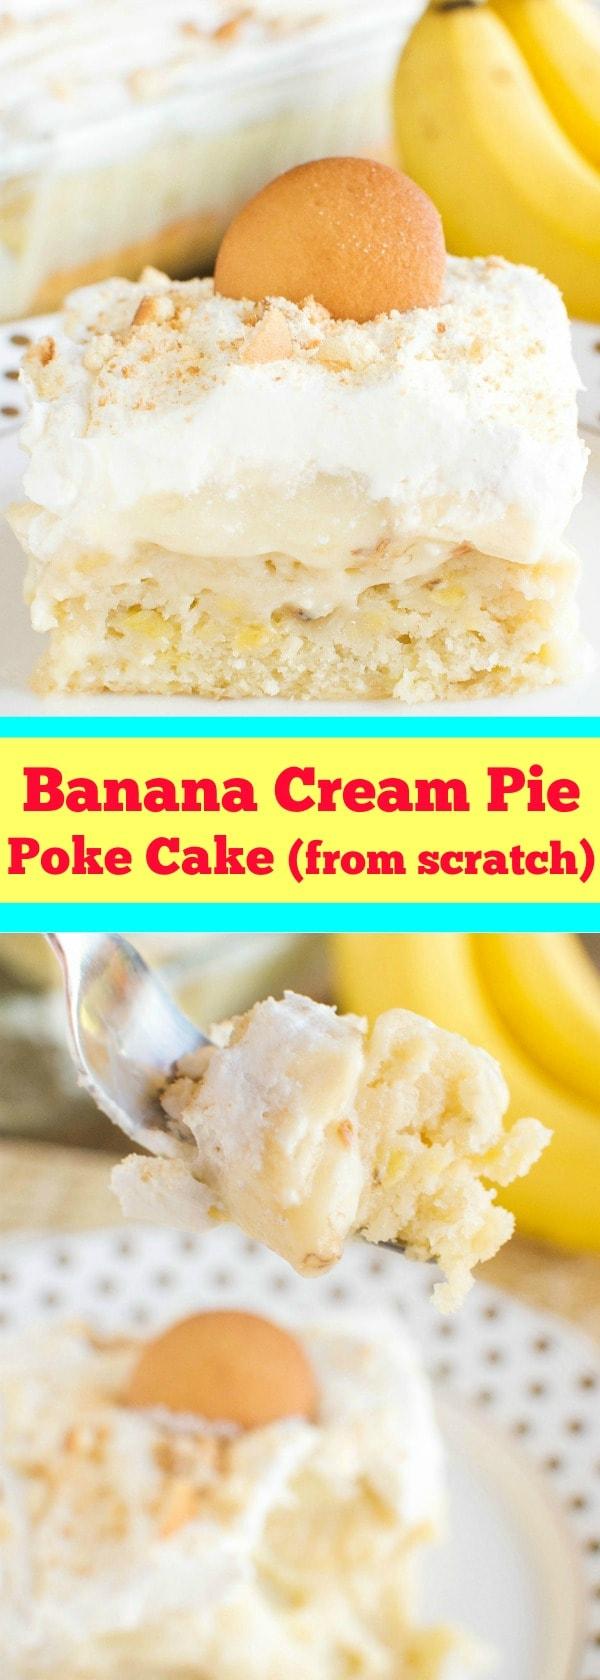 Homemade Banana Cream Pie Poke Cake - Holy Moly, you HAVE to make this!!!